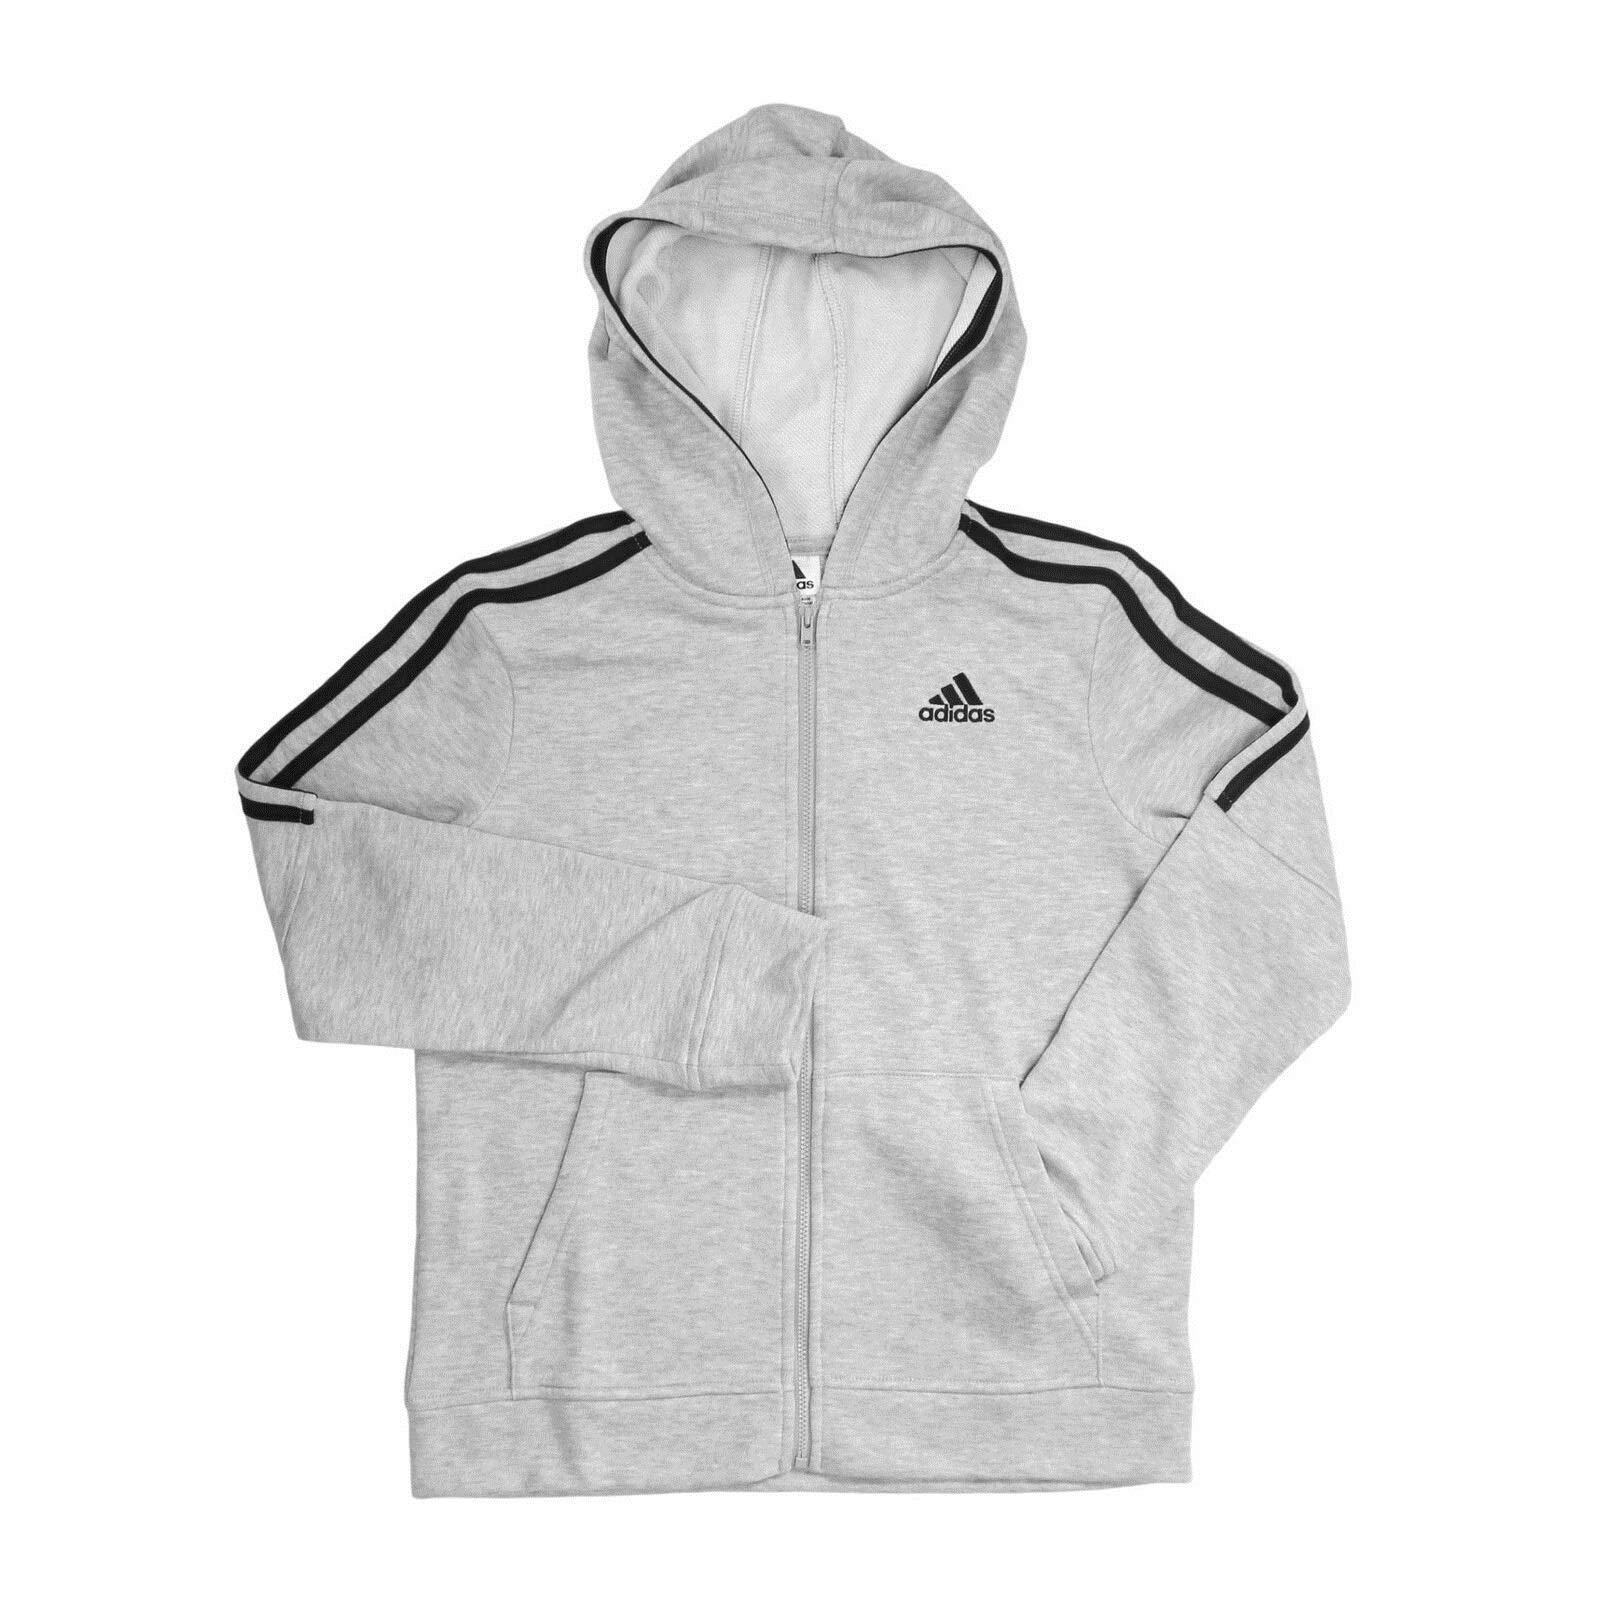 adidas Boys' Big Full Zip Athletic French Terry Hoodie Jacket, Grey Heather